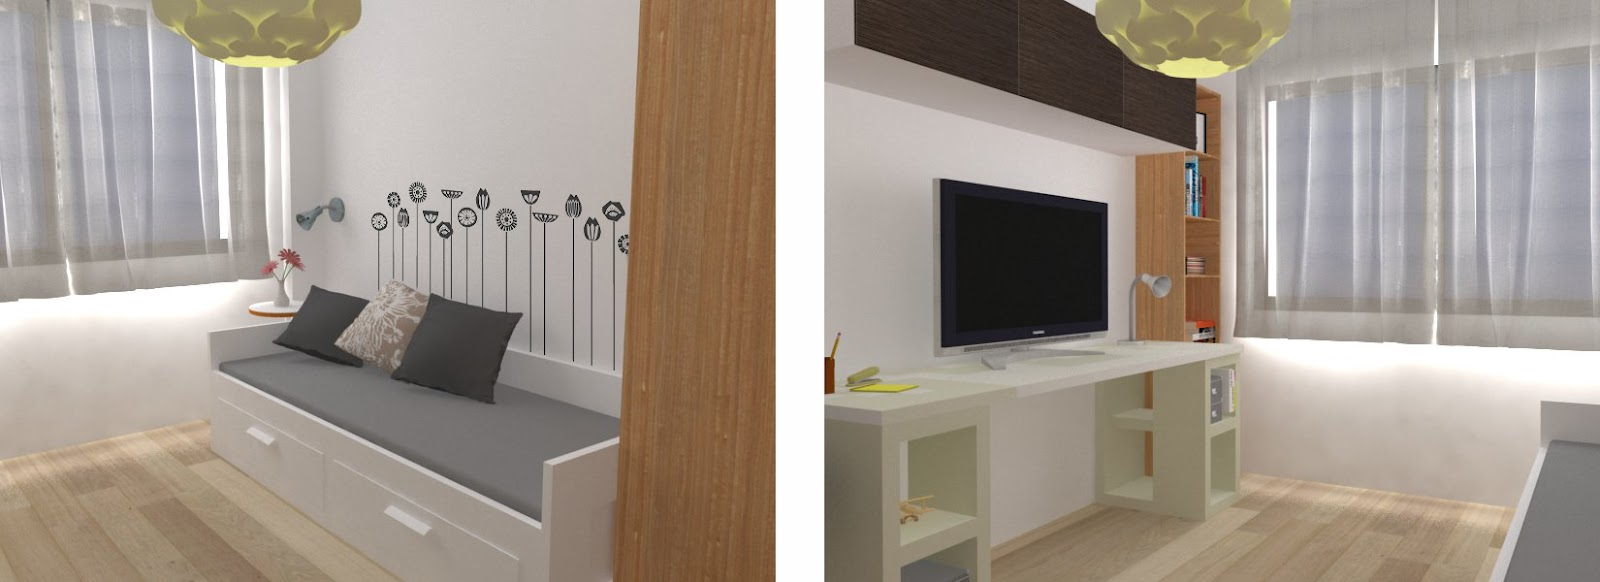 Estudio de arquitectura emearq emearq loves ikea en - Habitacion de invitados ...